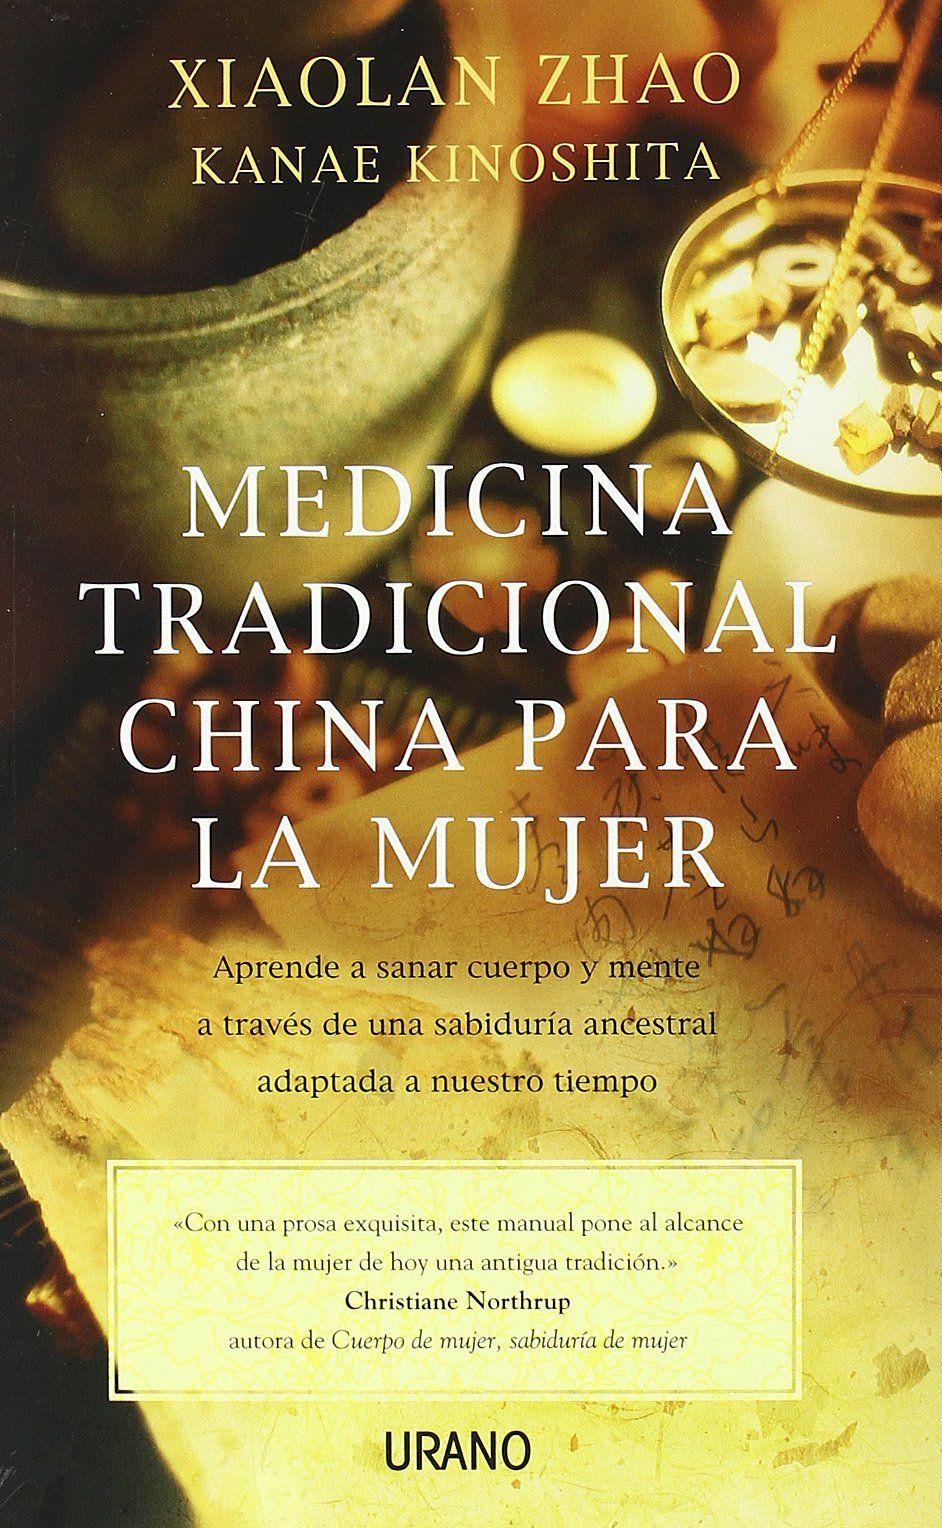 Útil manual que proporciona respuesta a diversos problemas de salud ...